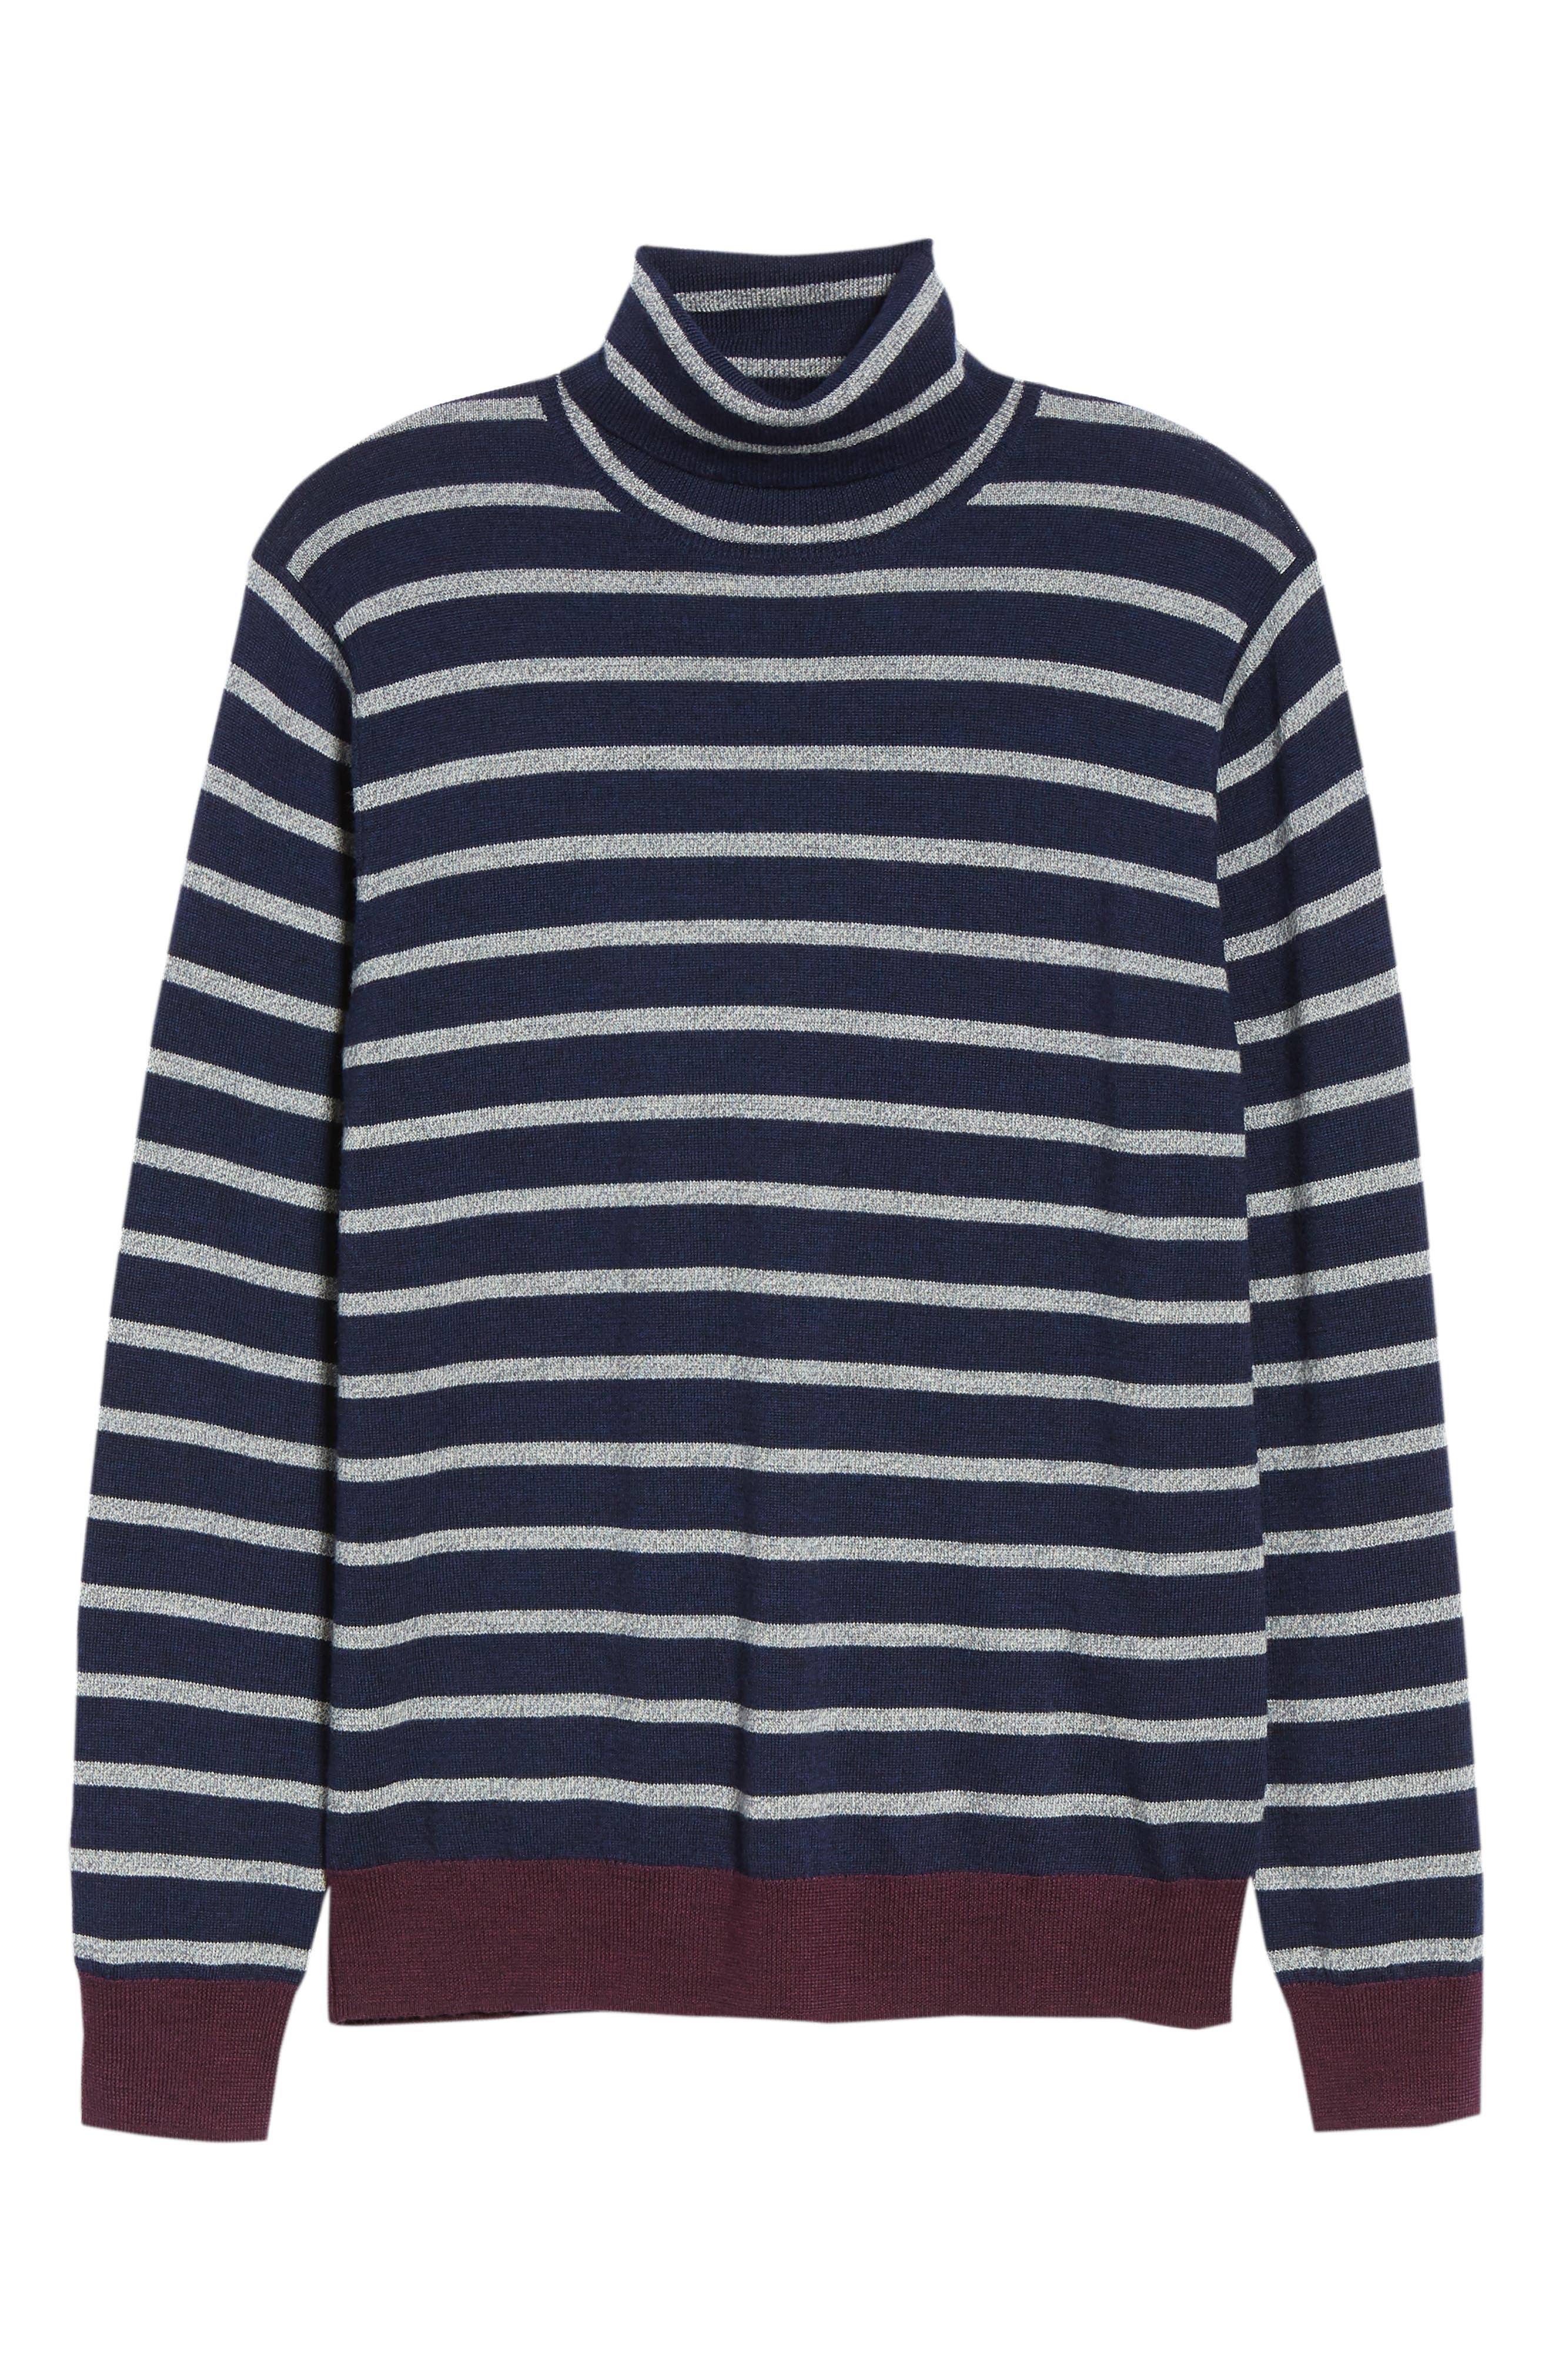 Slim Fit Turtleneck Merino Wool Sweater,                             Alternate thumbnail 6, color,                             HEATHER INK/ COOL GREY